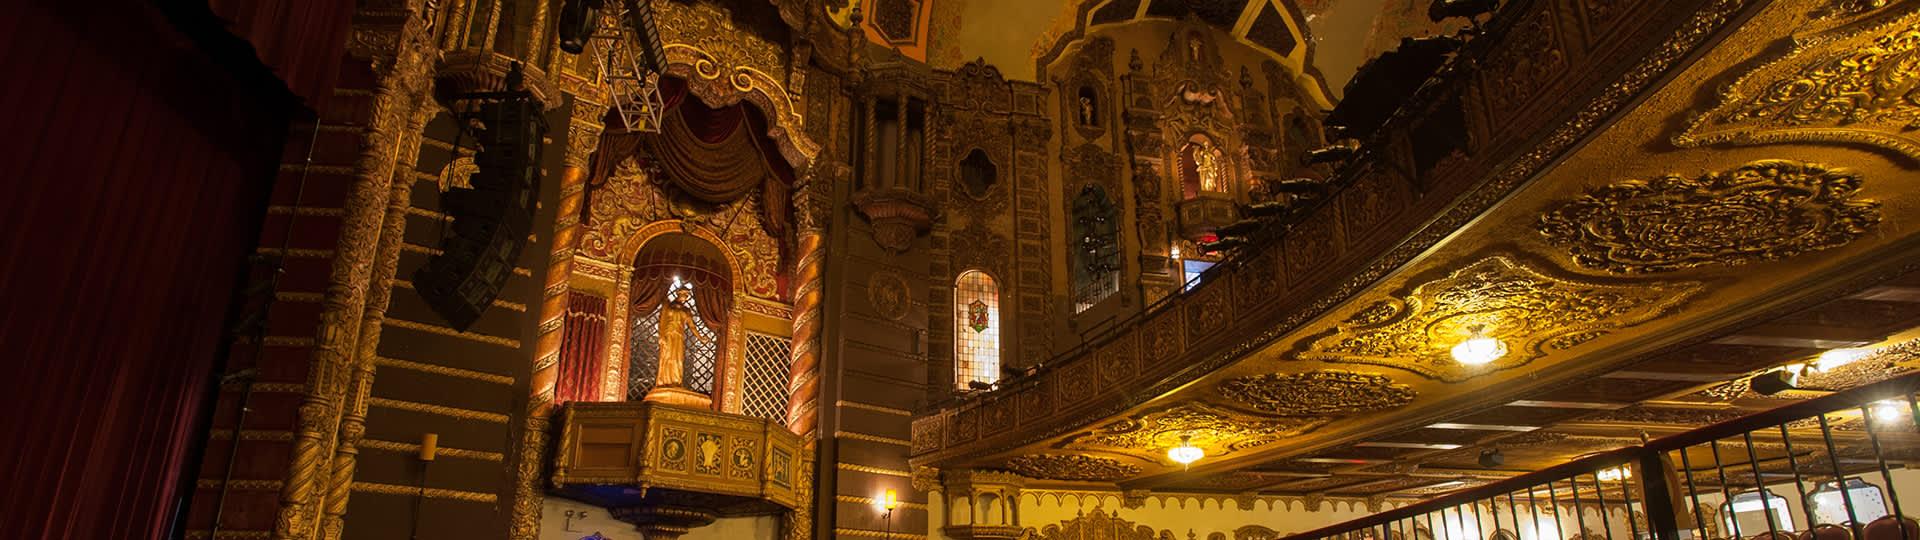 St George Theatre, St George, Staten Island,